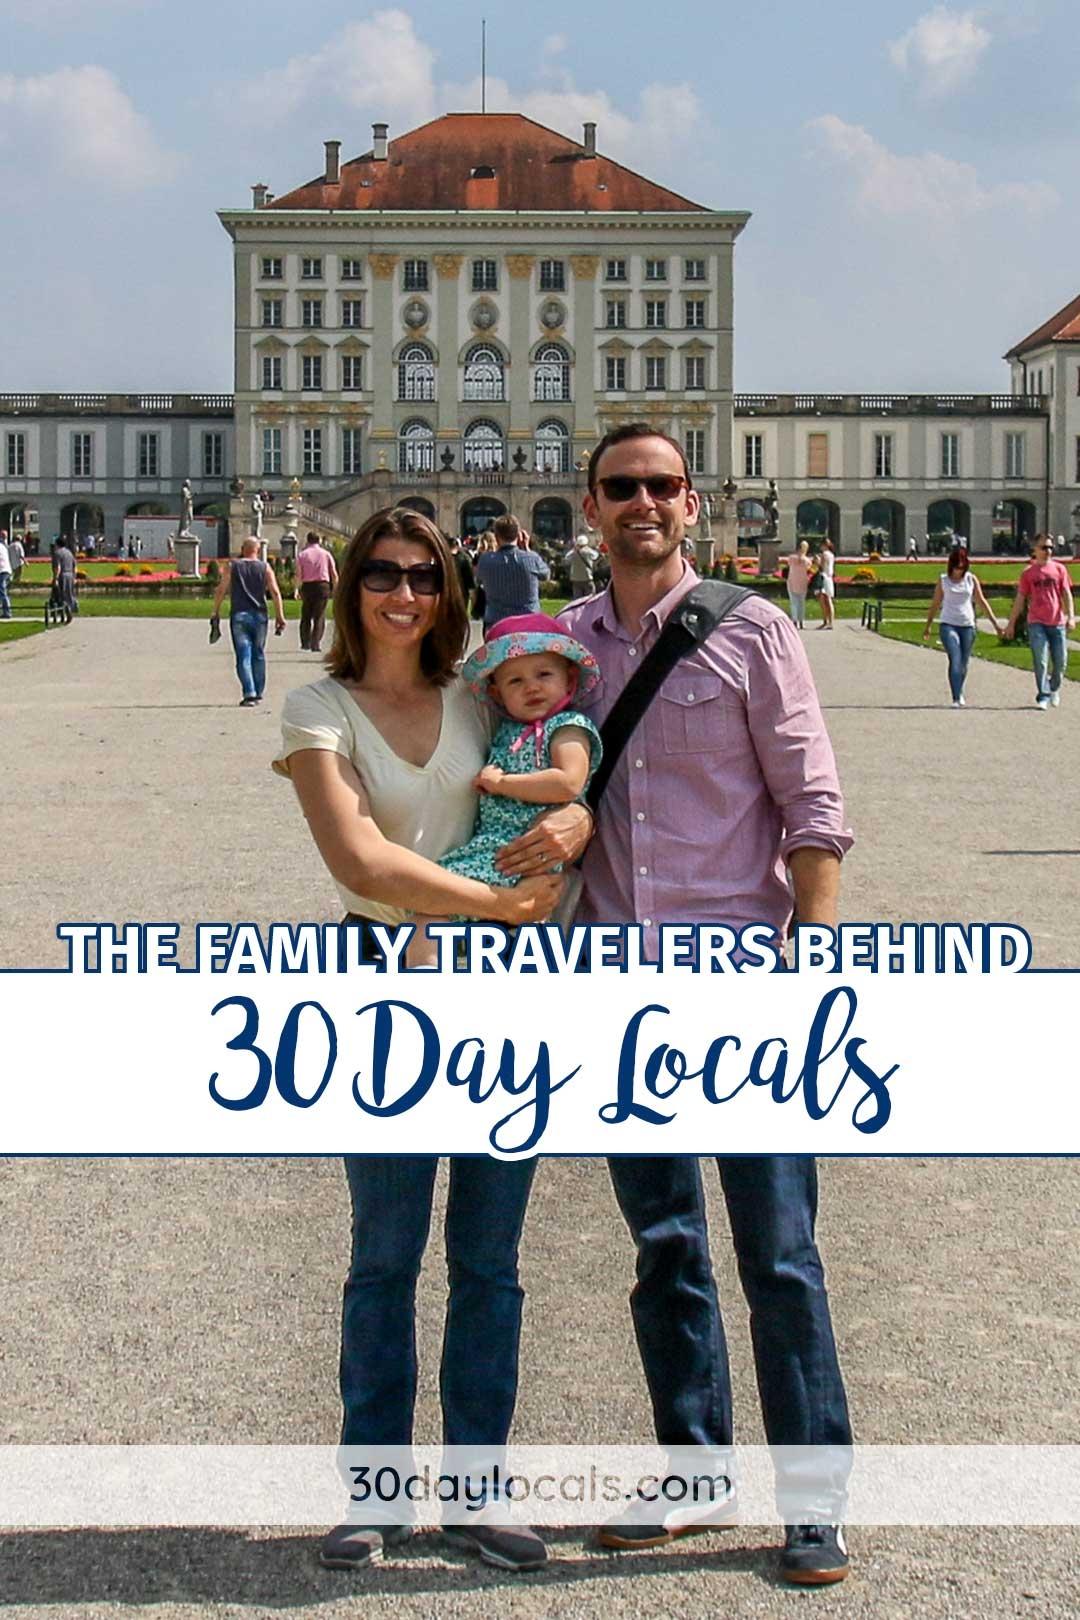 family-travelers-30-day-locals.jpg